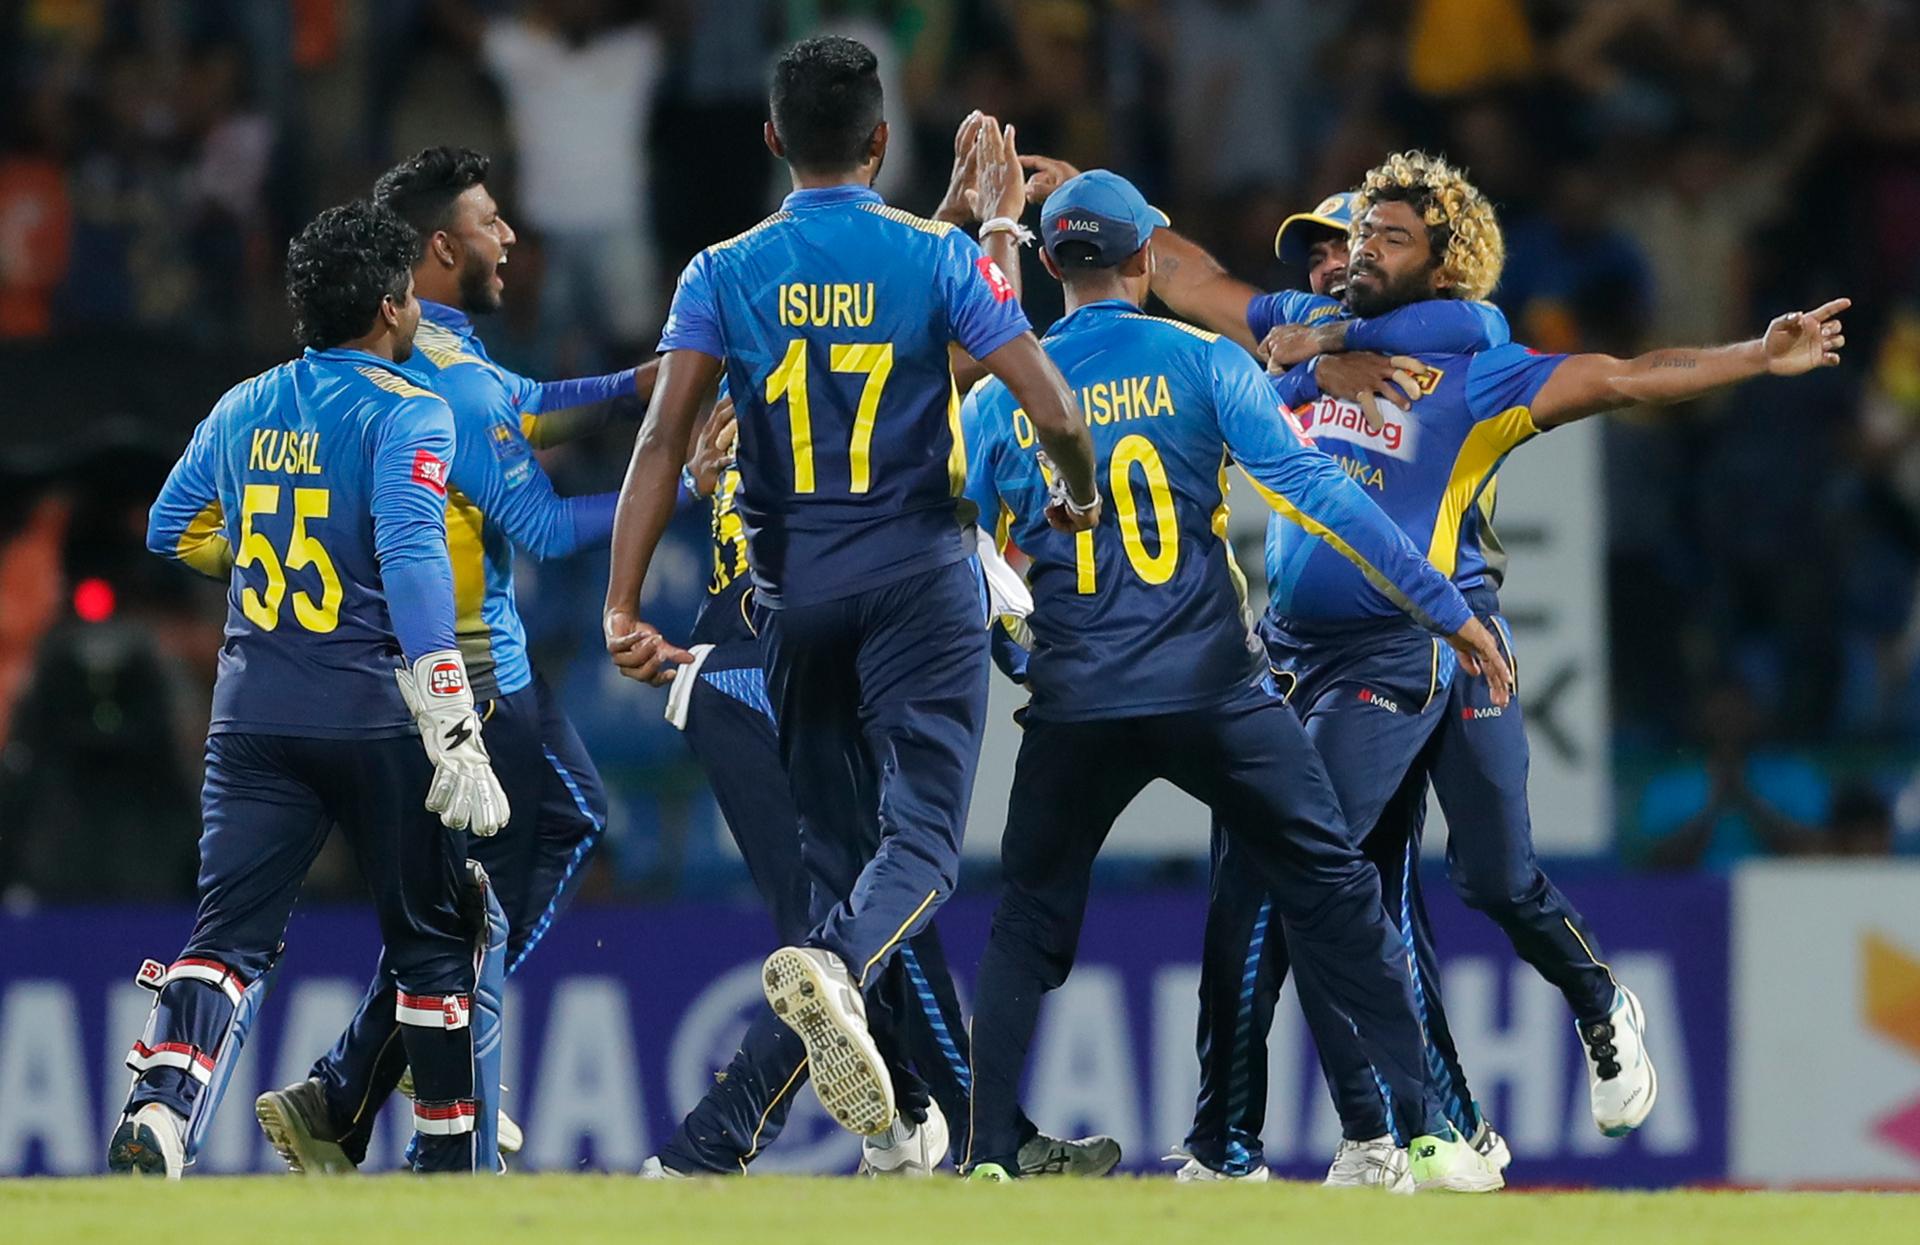 Four wickets in four balls! Freakish brilliance destroys bewildered Black Caps